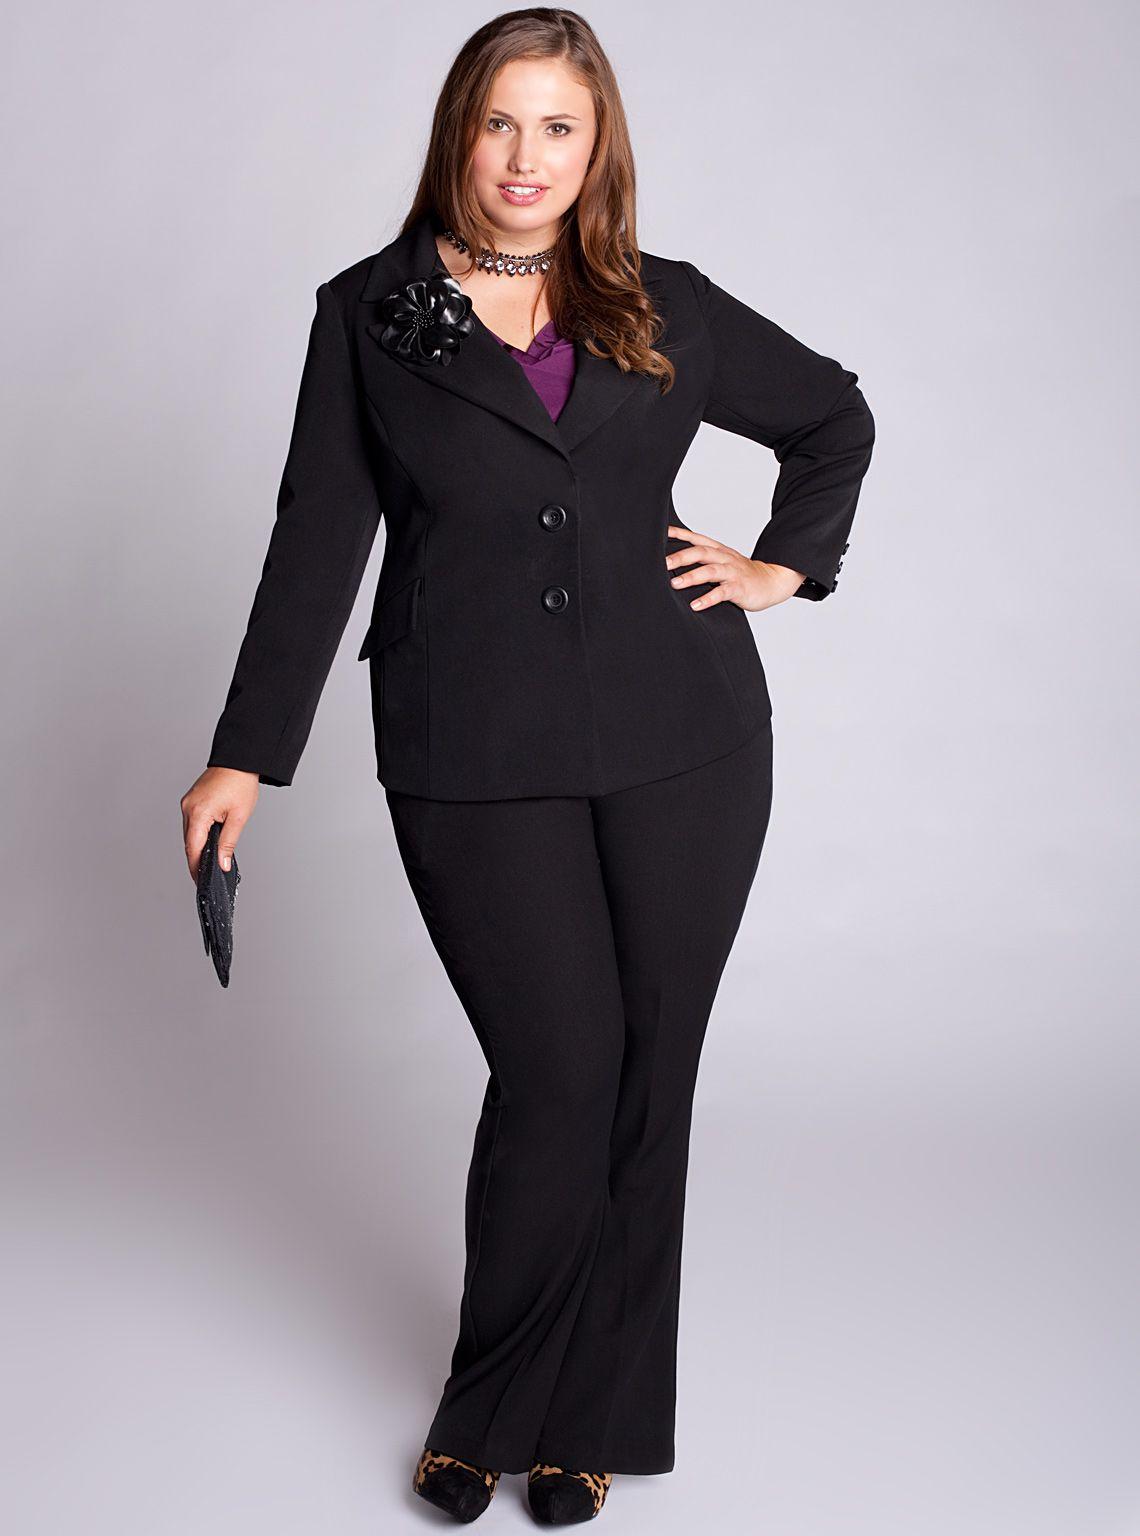 5 plus size tailoring tips - full figure plus | full figure